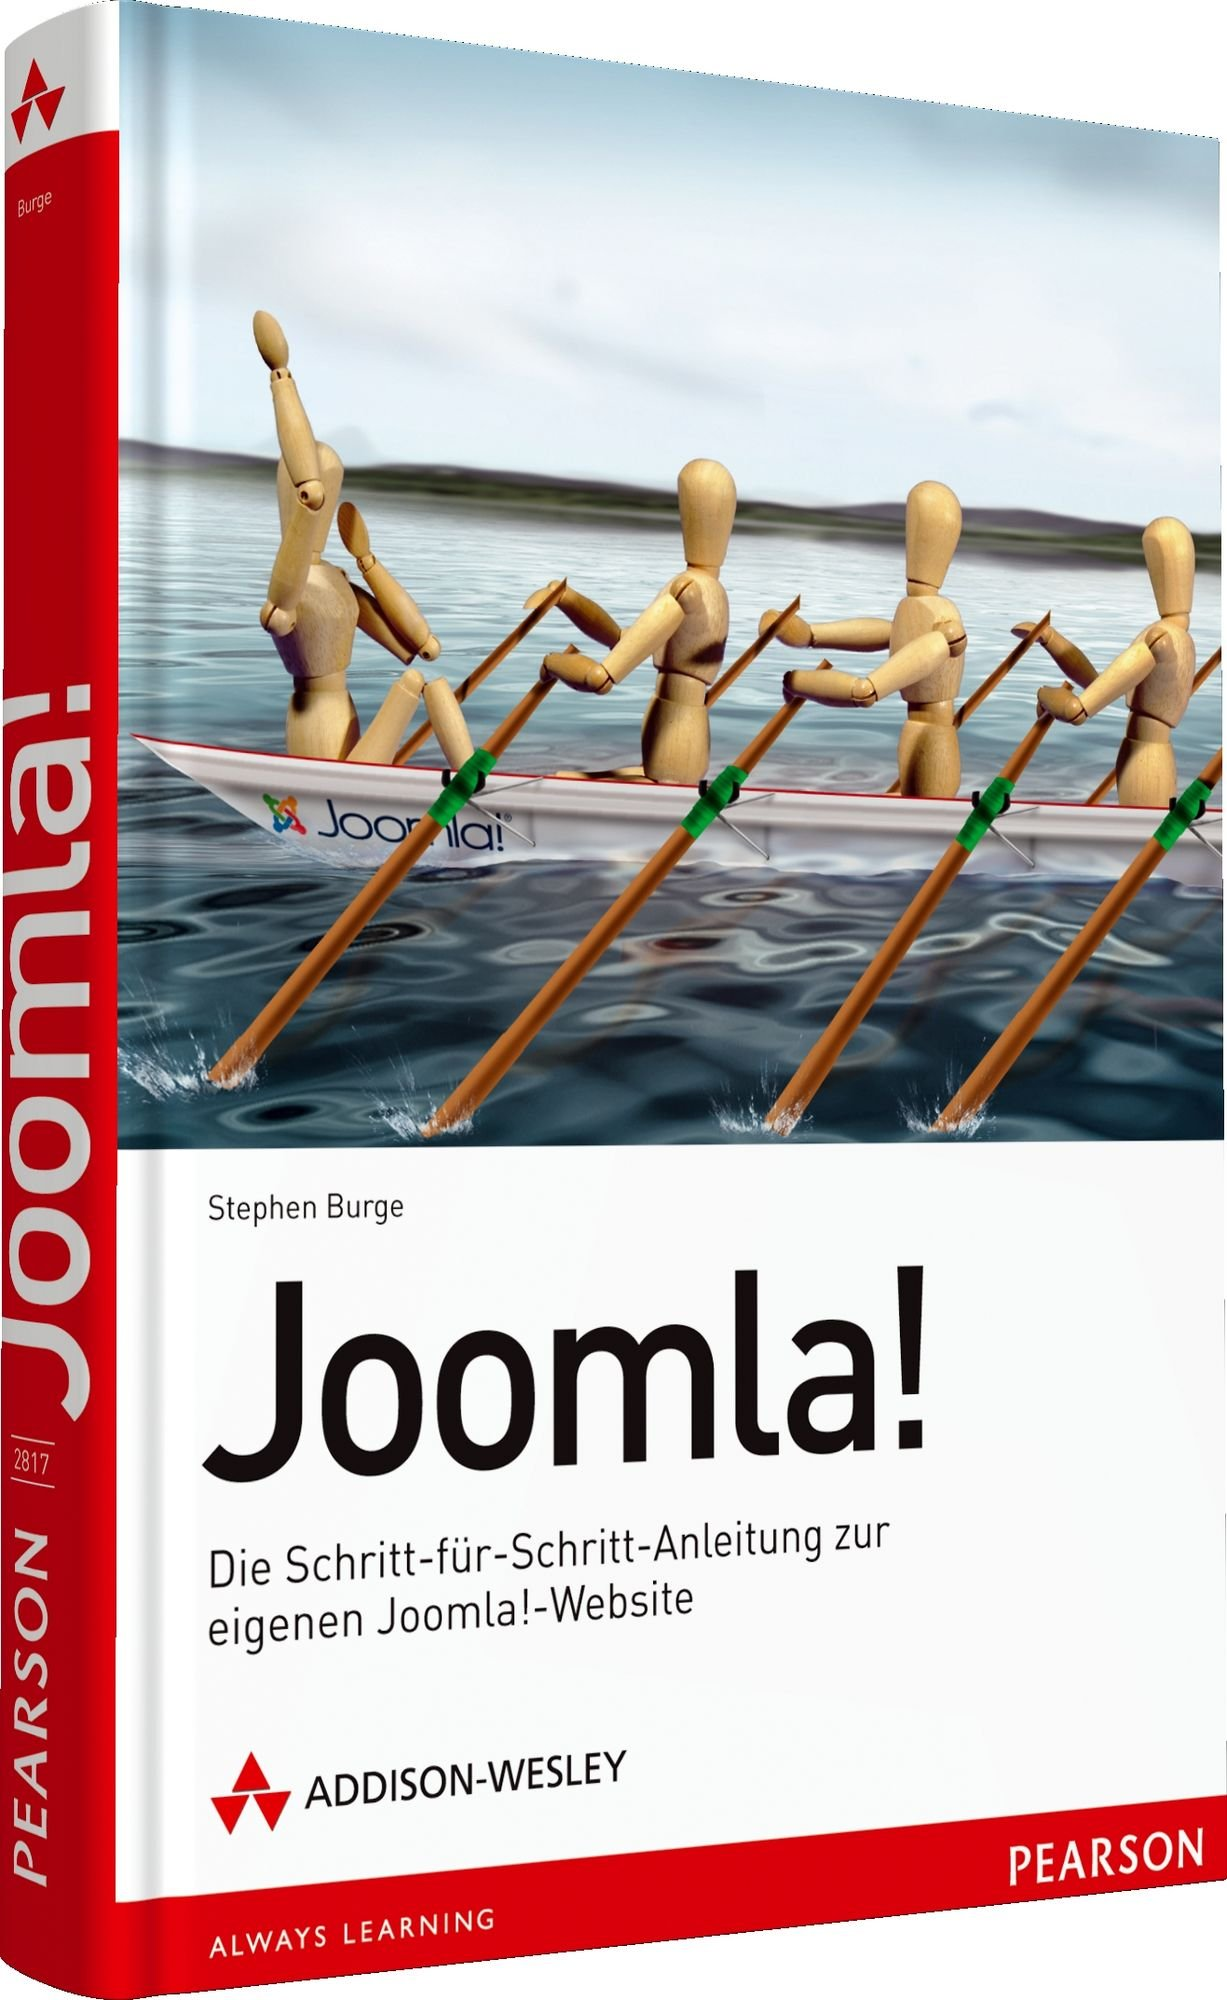 joomla-die-schritt-fr-schritt-anleitung-zur-eigenen-joomla-website-open-source-library